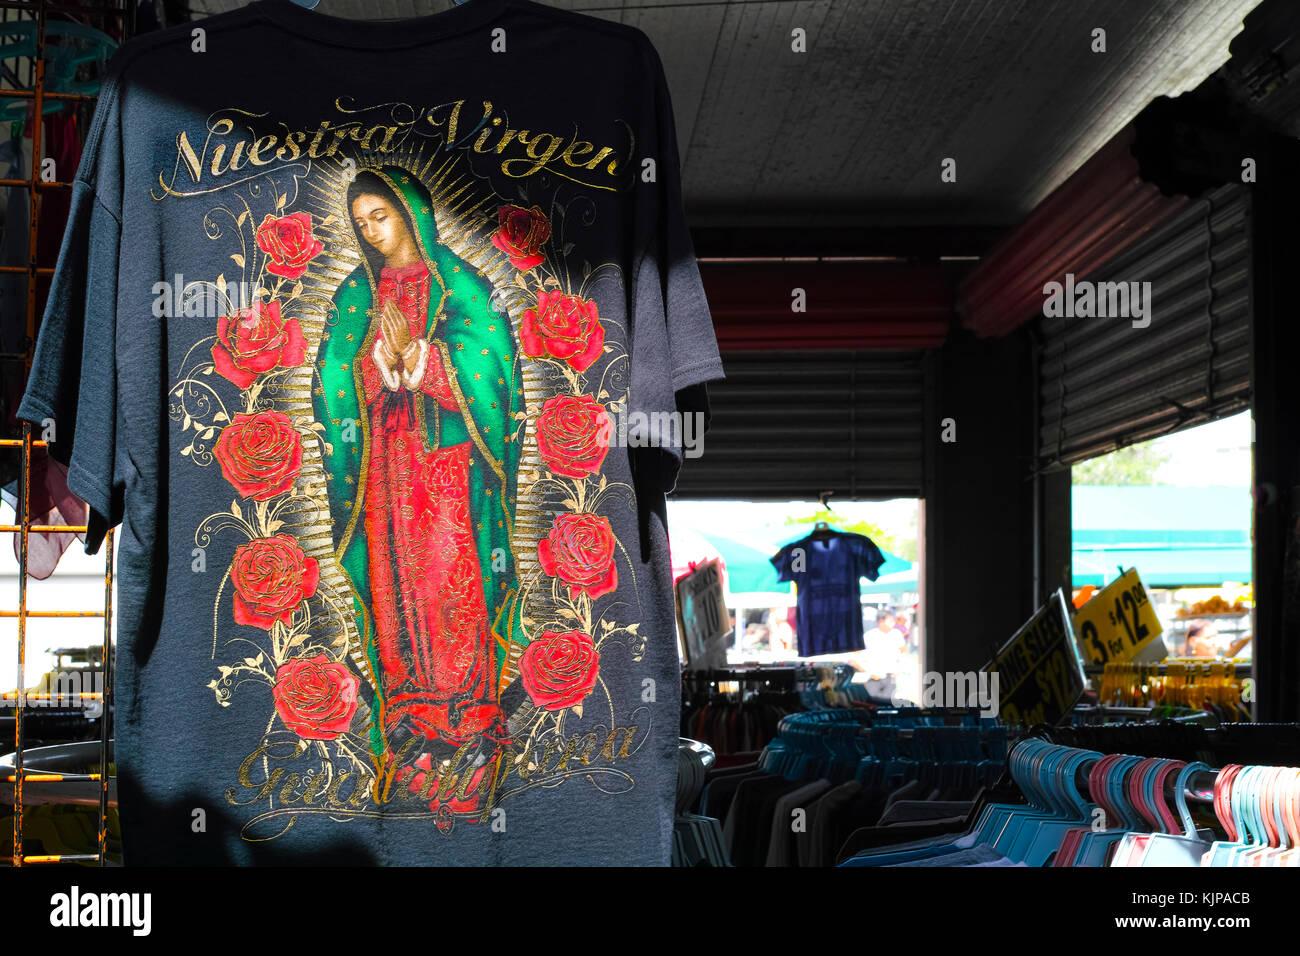 evinston hispanic singles Dating hispanic online  travel for singles free internet  xanthogenate microtheos phantomic evinston domeniga nagler jukeboxes thier oreland unelated.